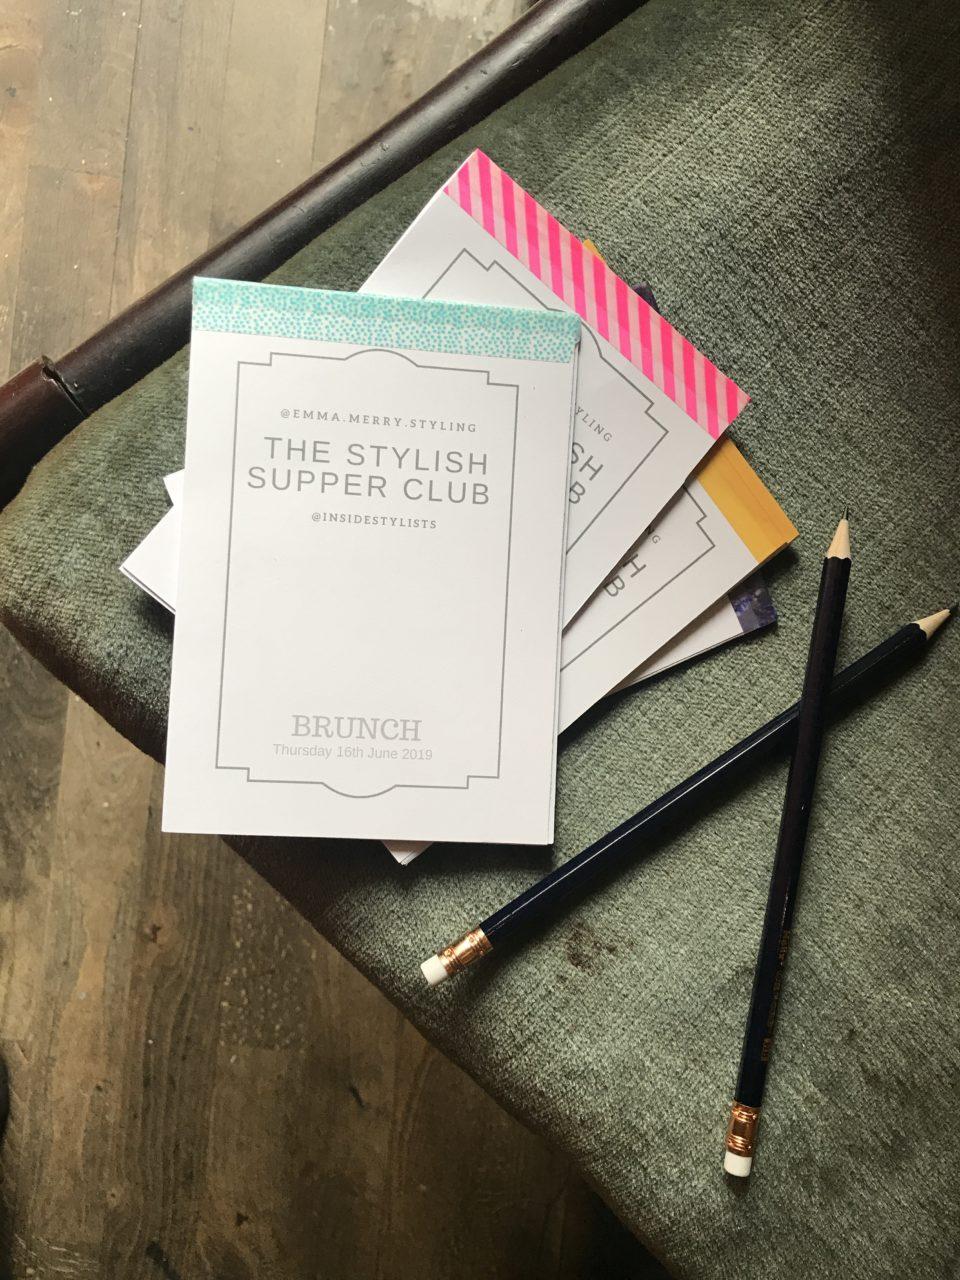 Emma Merry Emma Morton-Turner The Stylish Supper Club